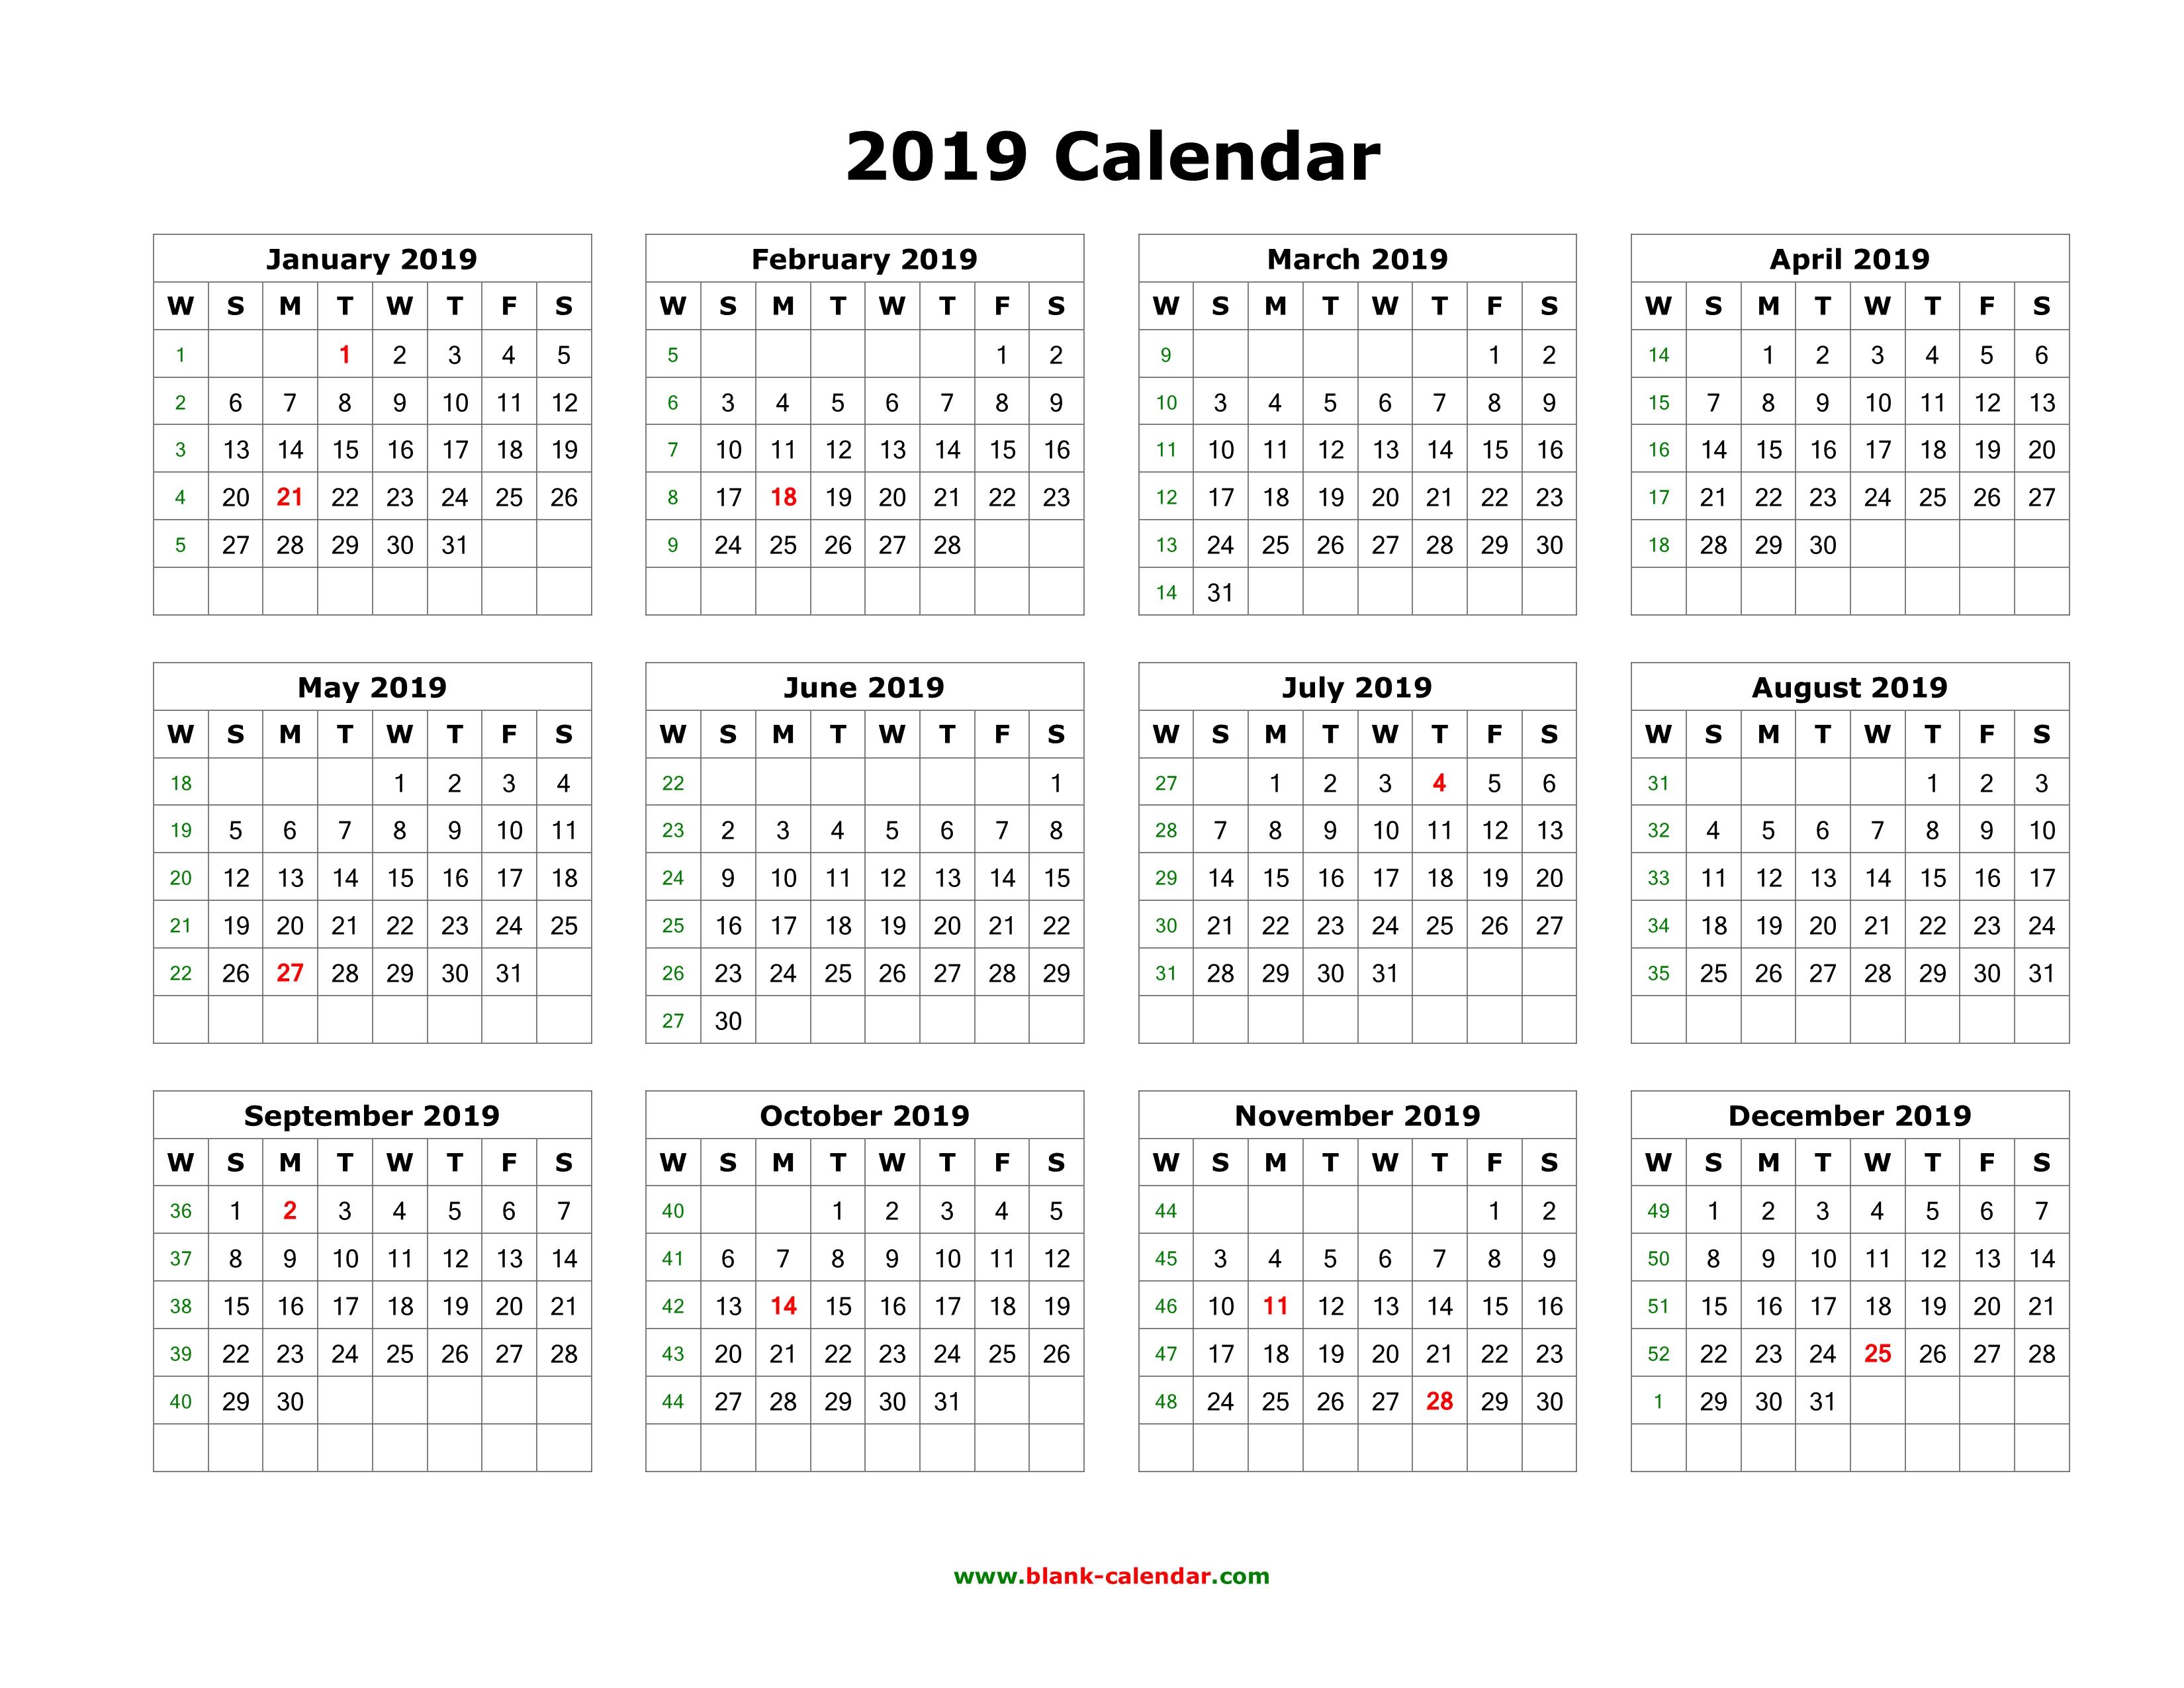 Blank 2019 Calendar Months - Erha.yasamayolver with Blank Calender Academic Year 2019 -2020